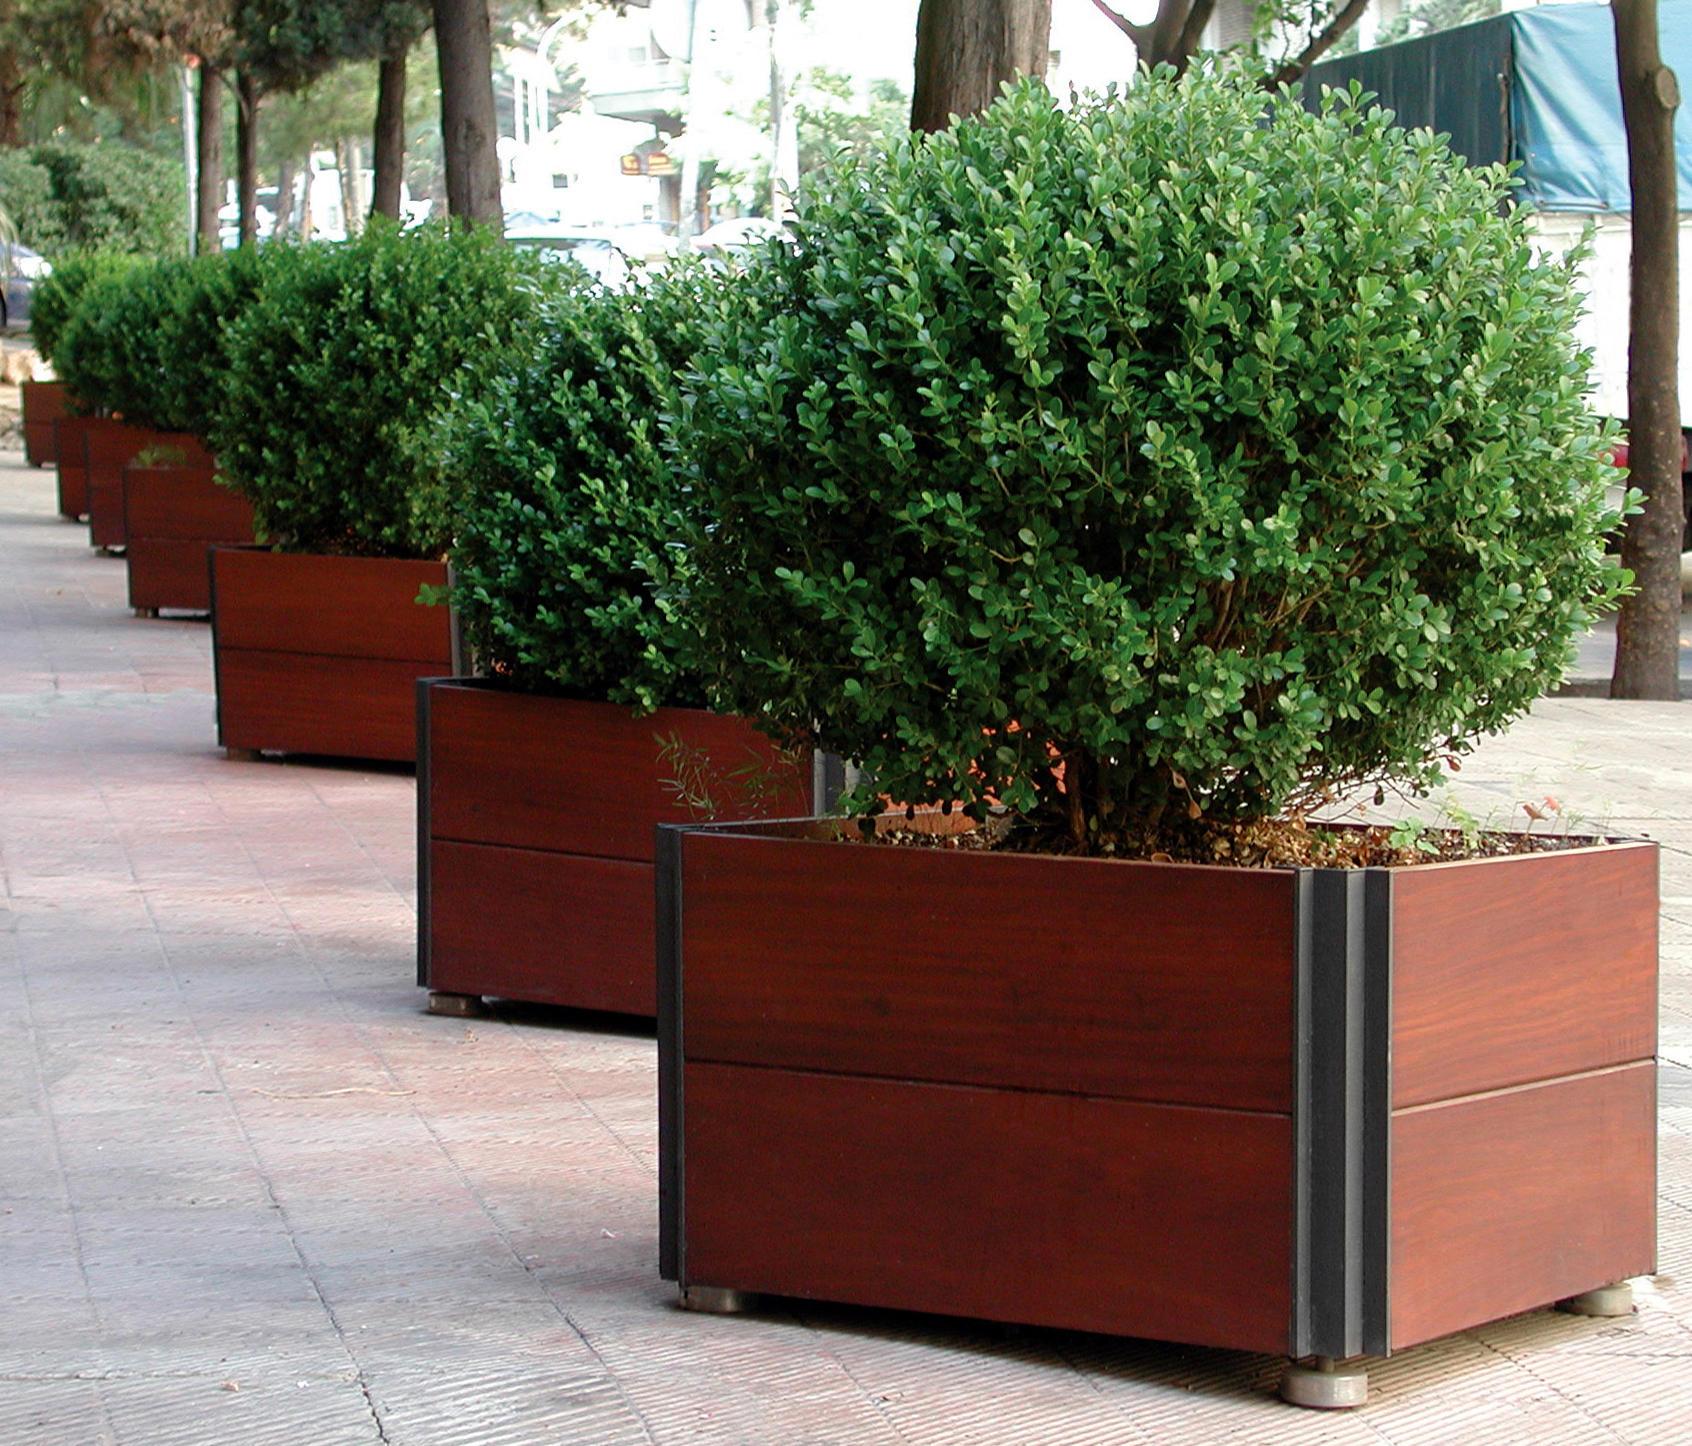 Plaza planters from santa cole architonic - Tipos de jardineras ...